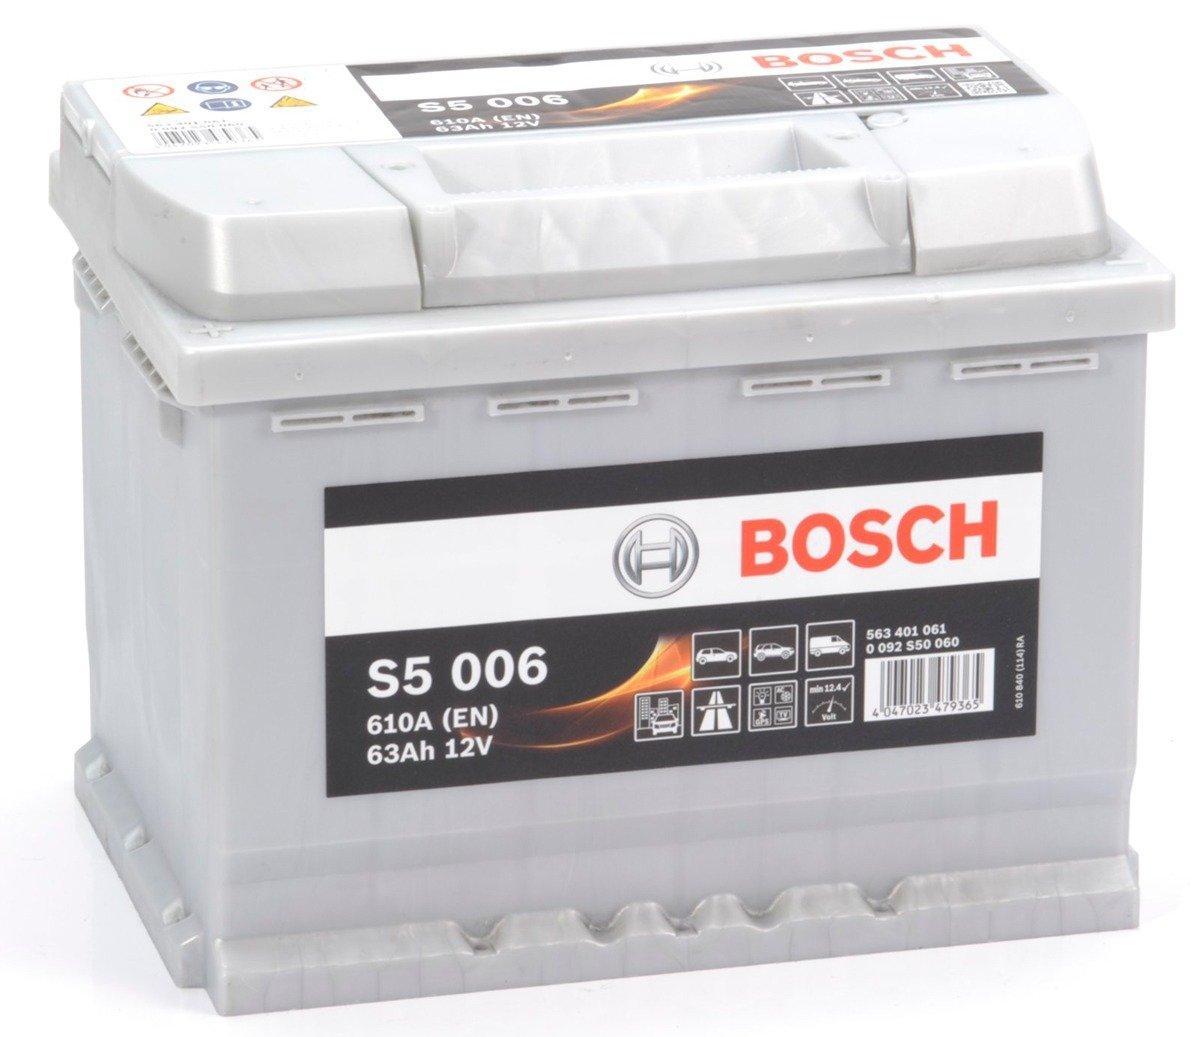 battery 12v 63ah s5006 bosch s5 akumulatory car batteries bosch bosch s5. Black Bedroom Furniture Sets. Home Design Ideas